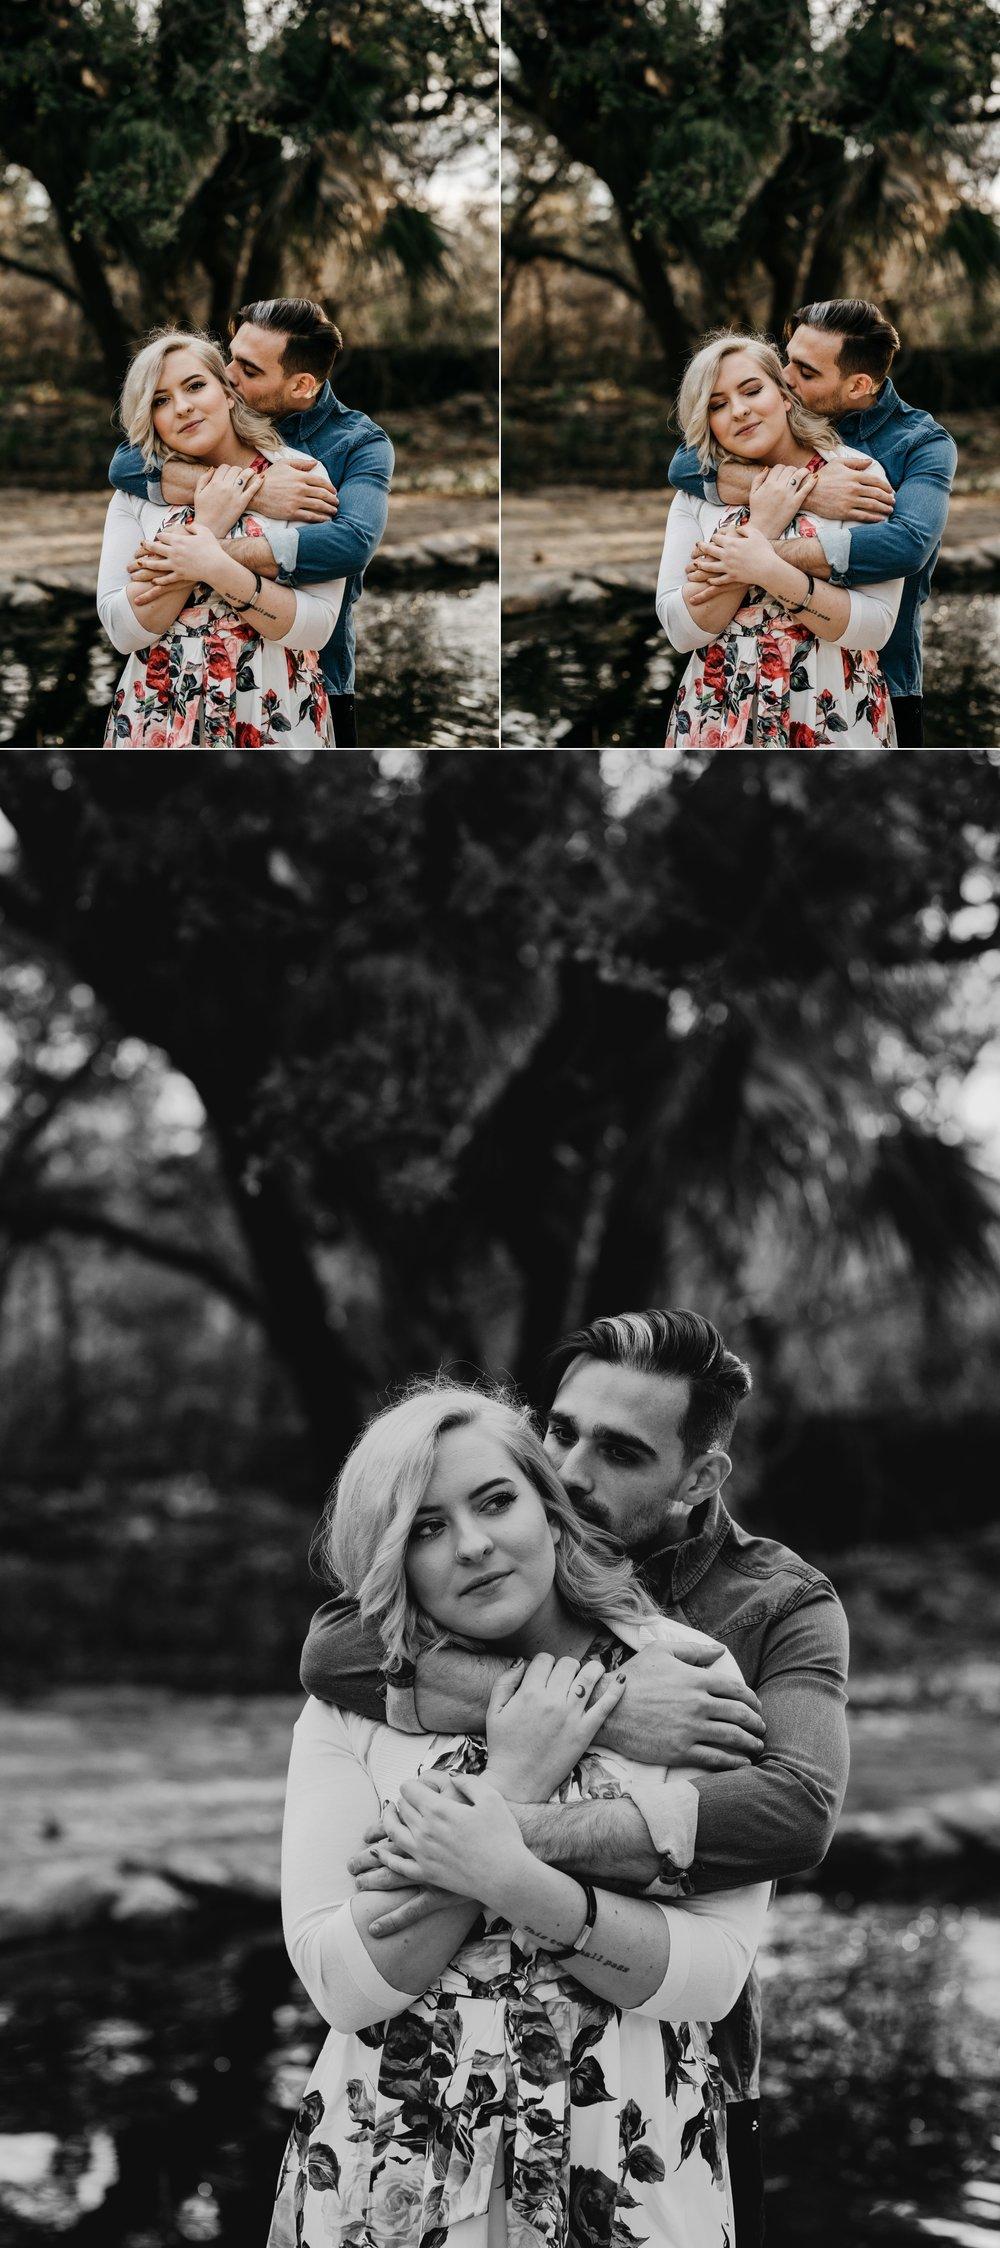 drew-andrew-texas-austin-minnesota-minneapolis-wedding-photographer-destination-elopement-intimate-adventurous_0076.jpg